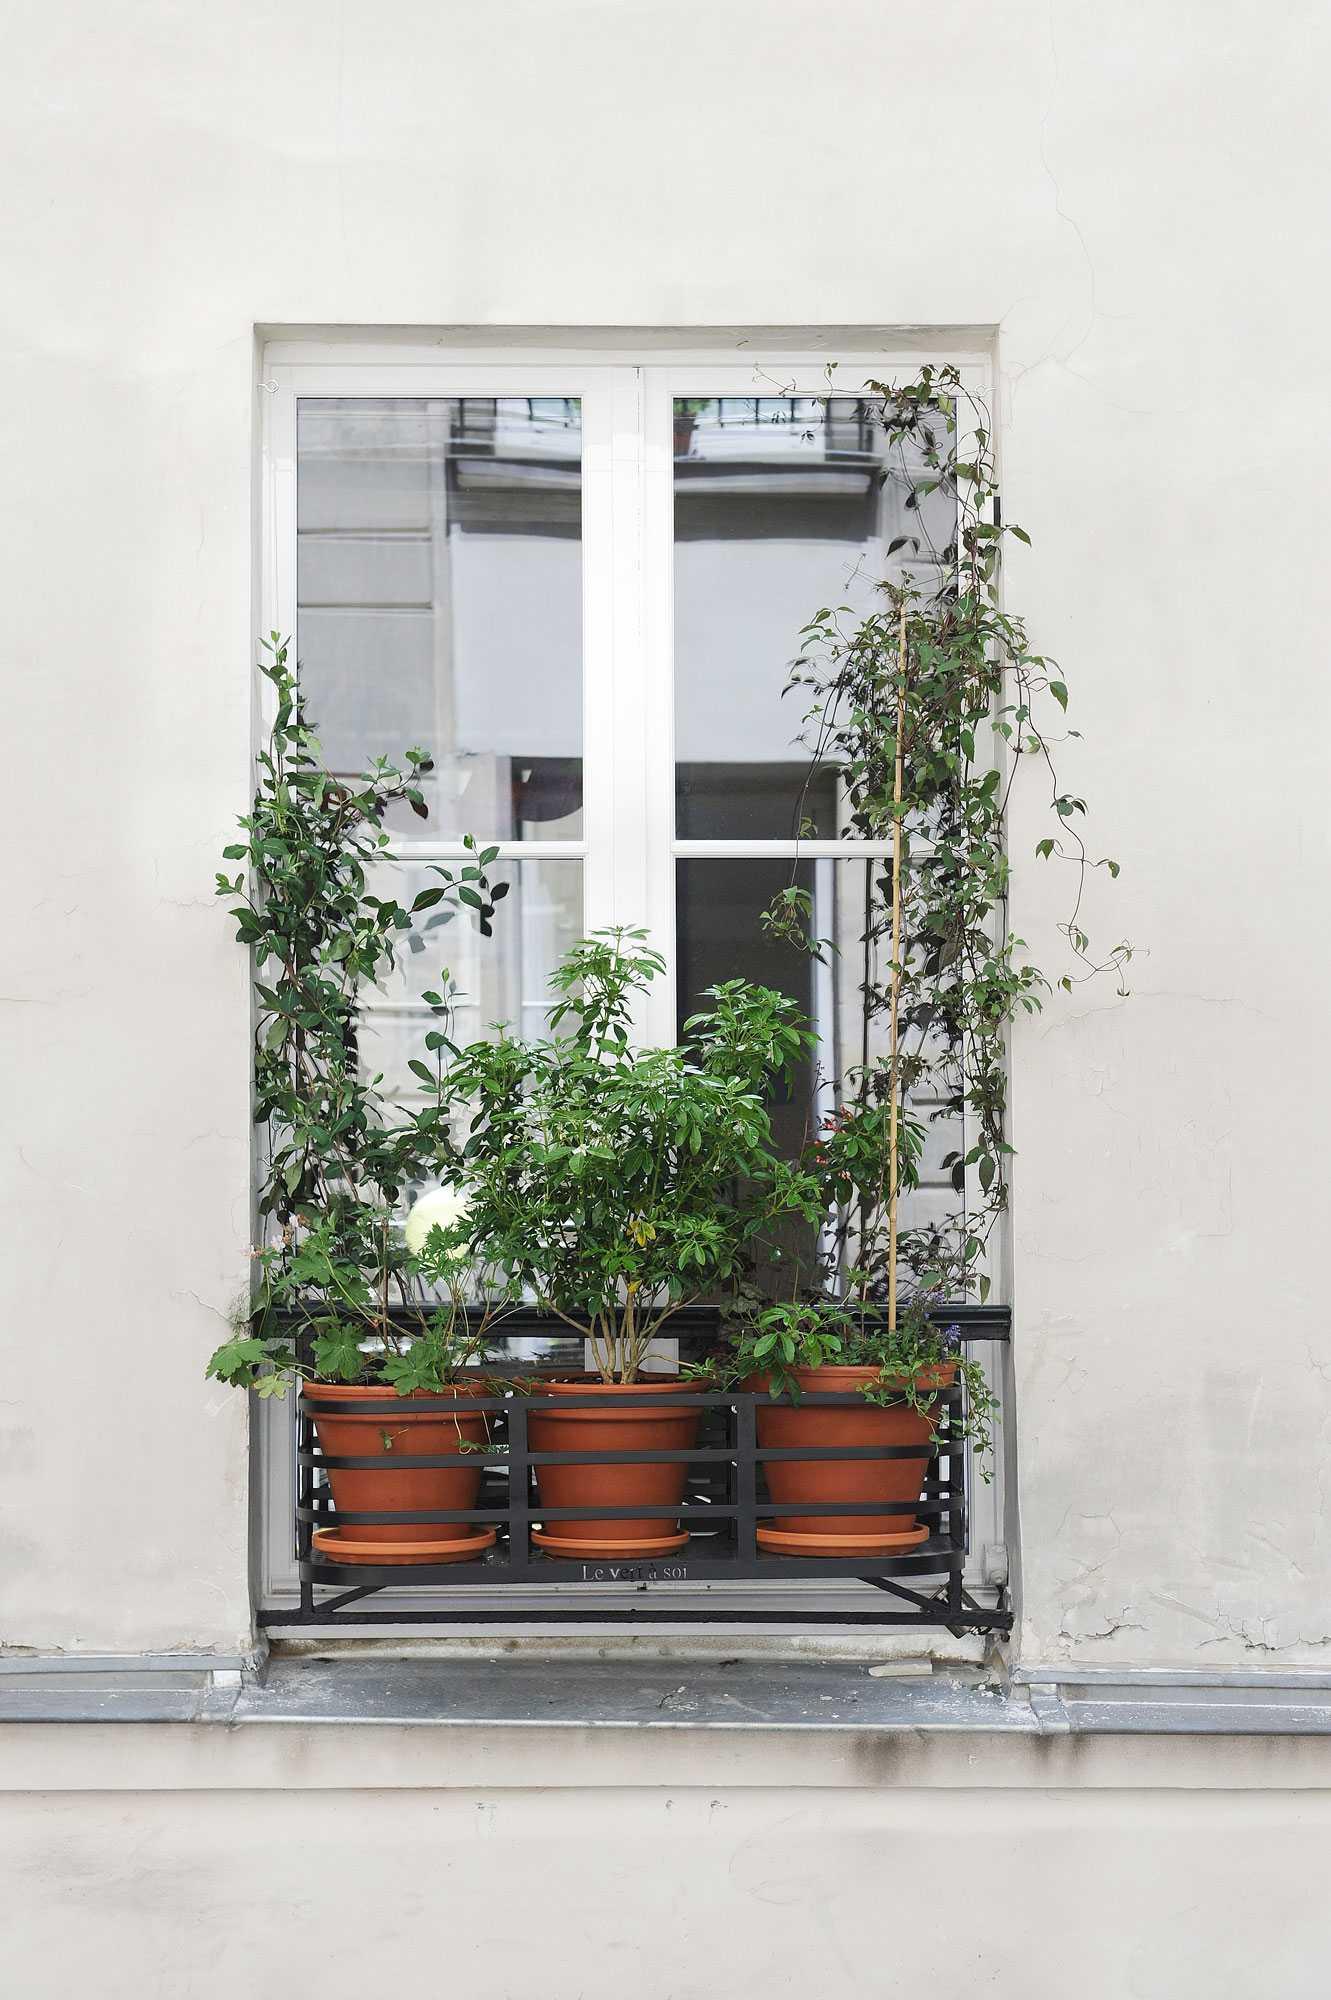 tiquetone 006 le vert soi. Black Bedroom Furniture Sets. Home Design Ideas